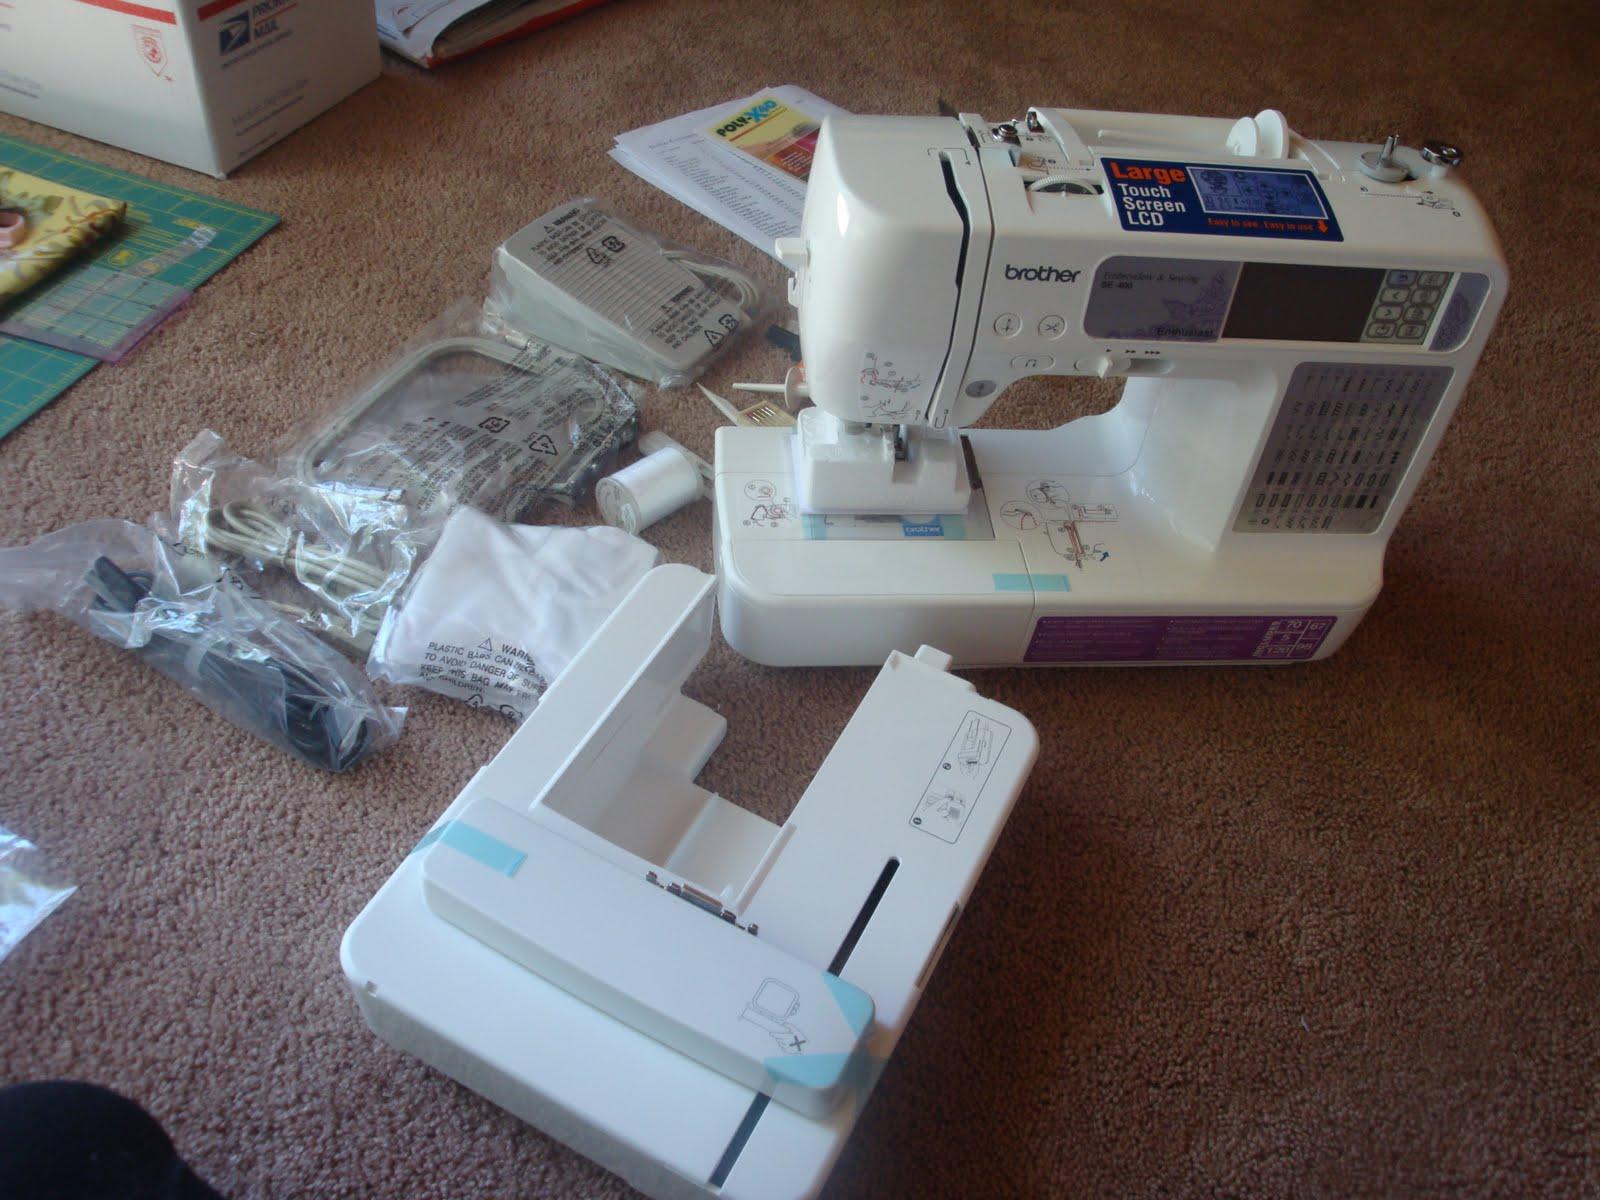 husqvarna viking 400 computer sewing machine reviews